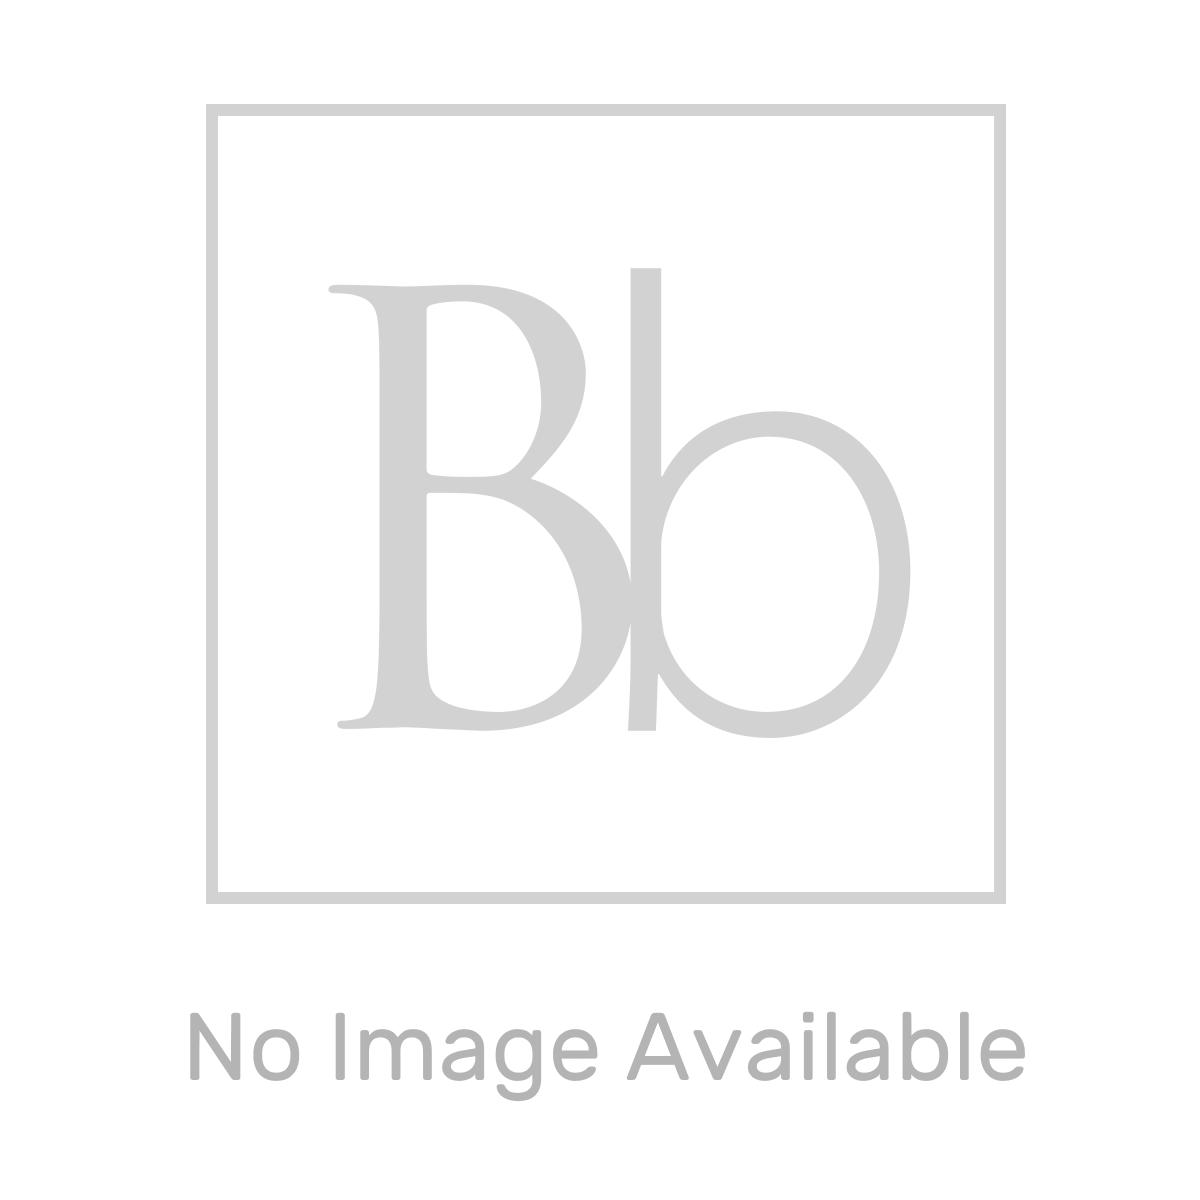 Nuie Vault Gloss Grey Mist Single Door Wall Hung Unit Inc' Basin 400mm Line Drawing